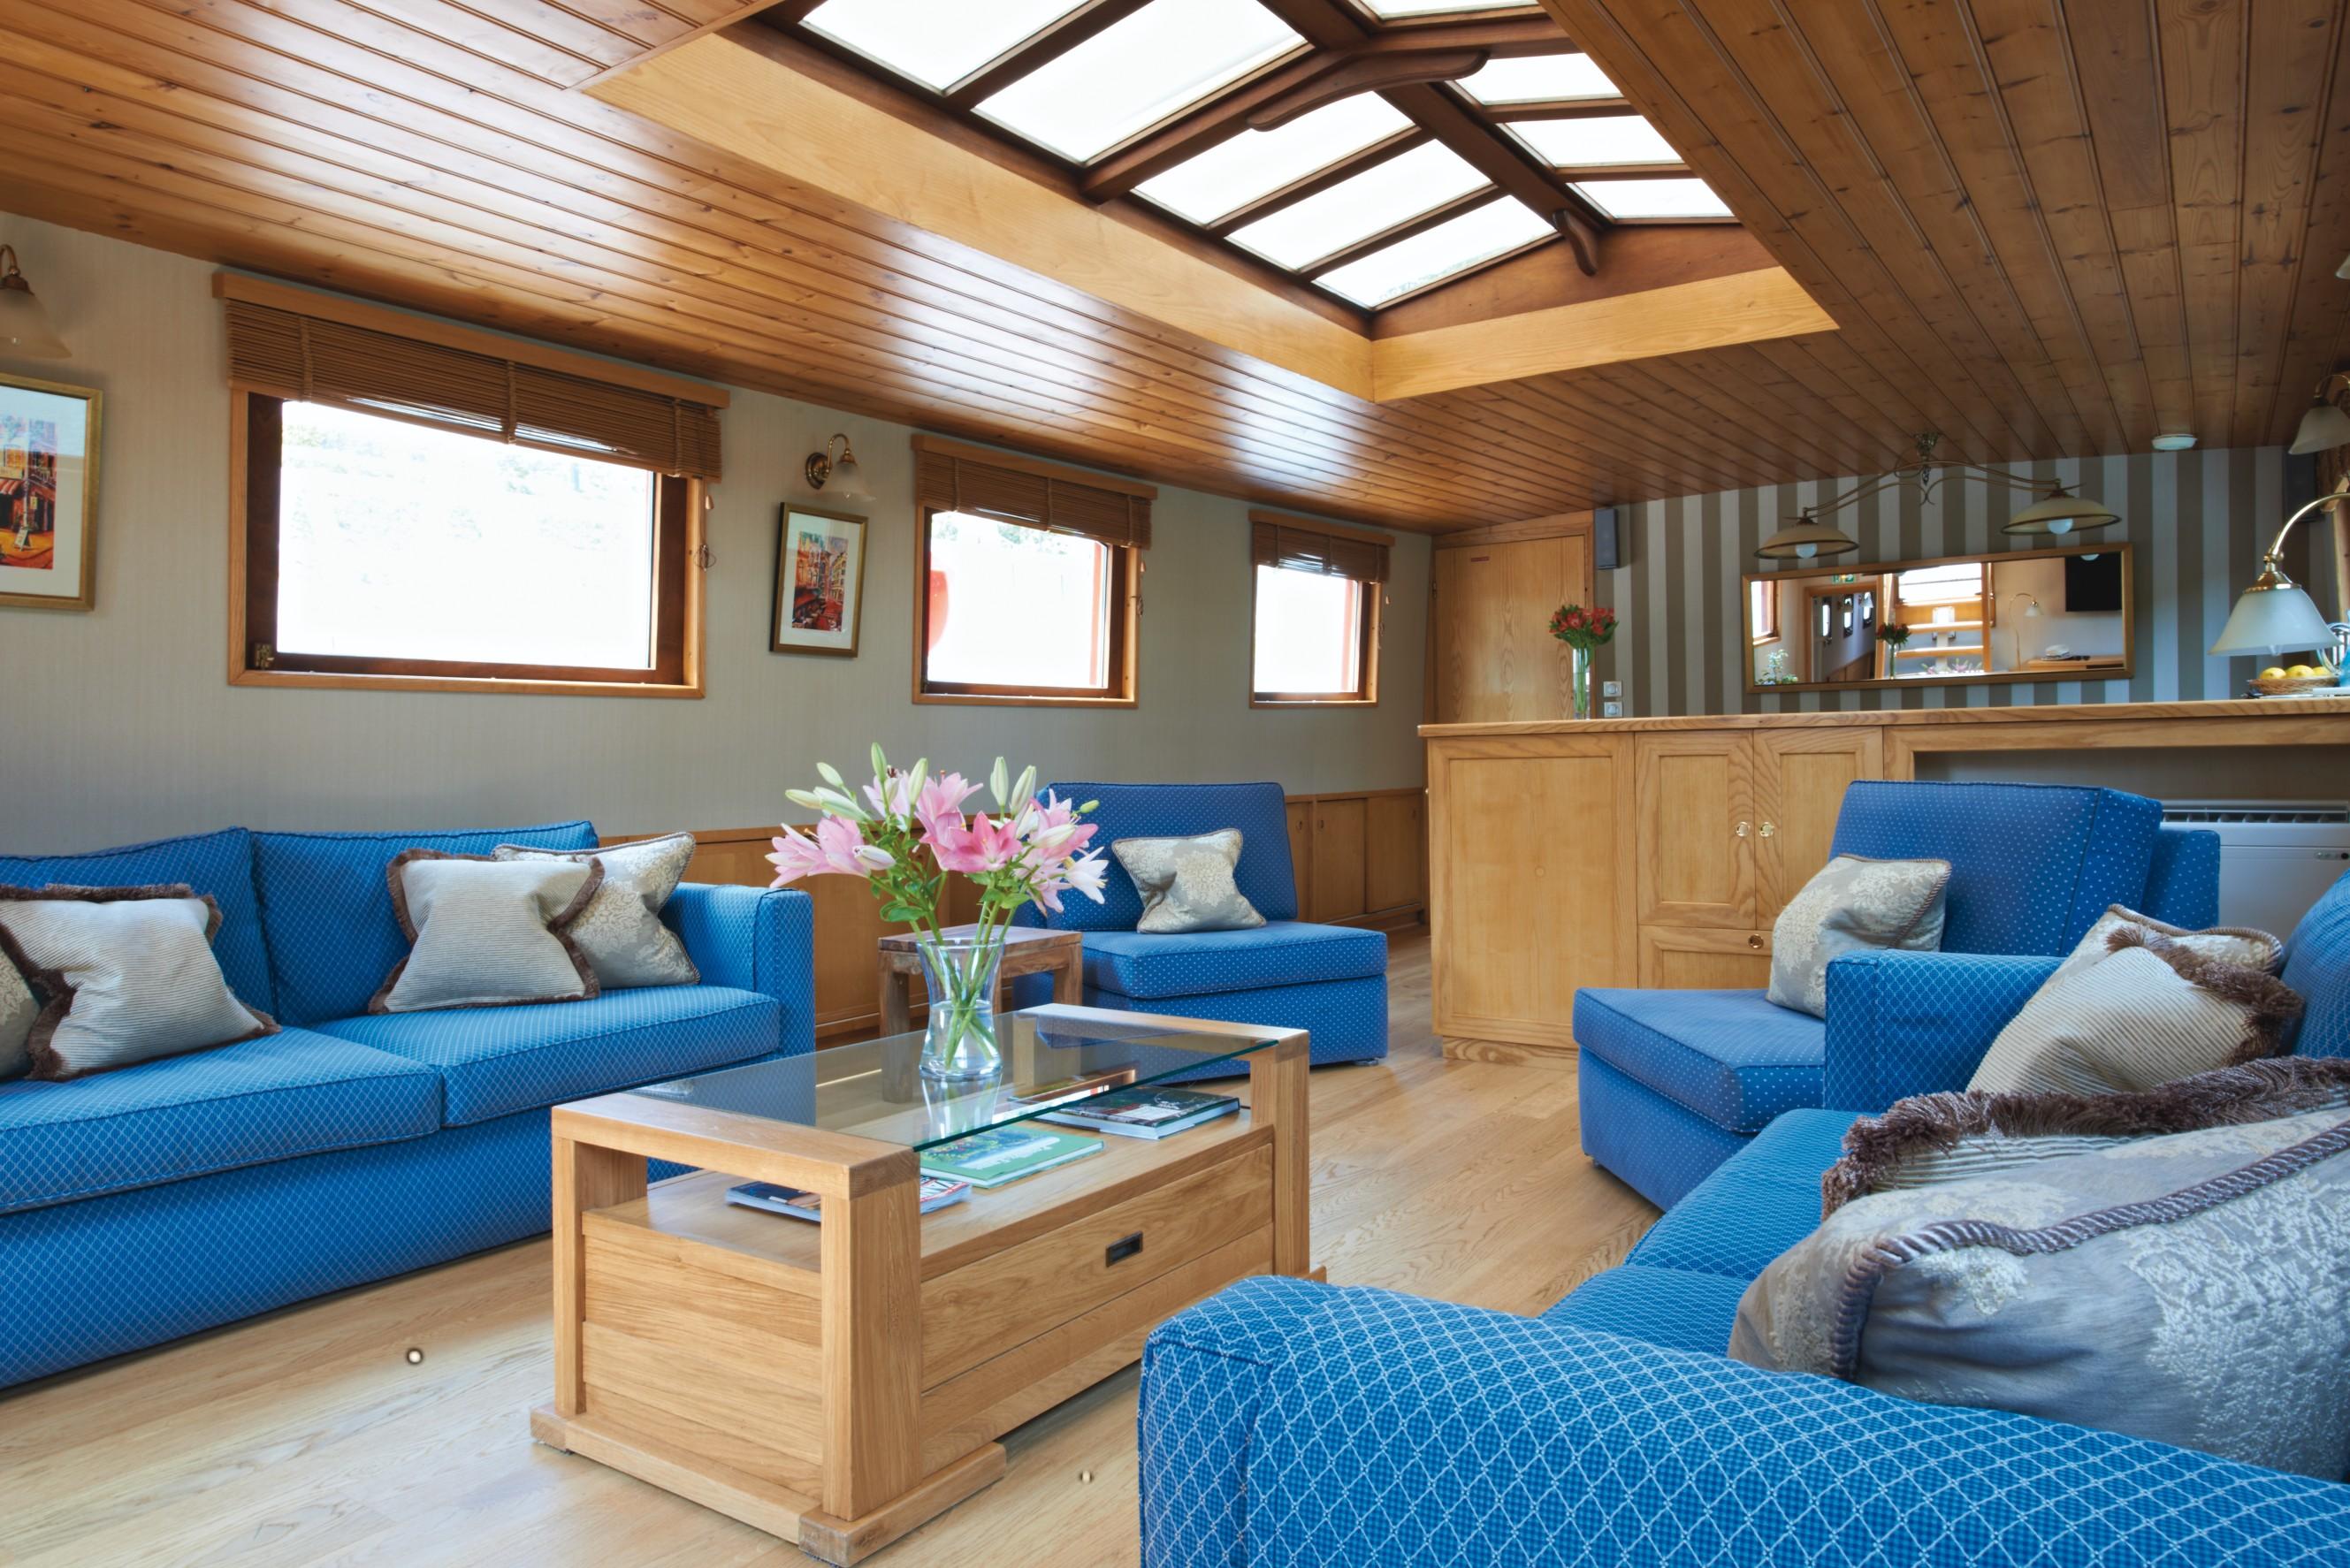 Belmond River Cruises Belmond Hirondelle Interior Lounge.jpg